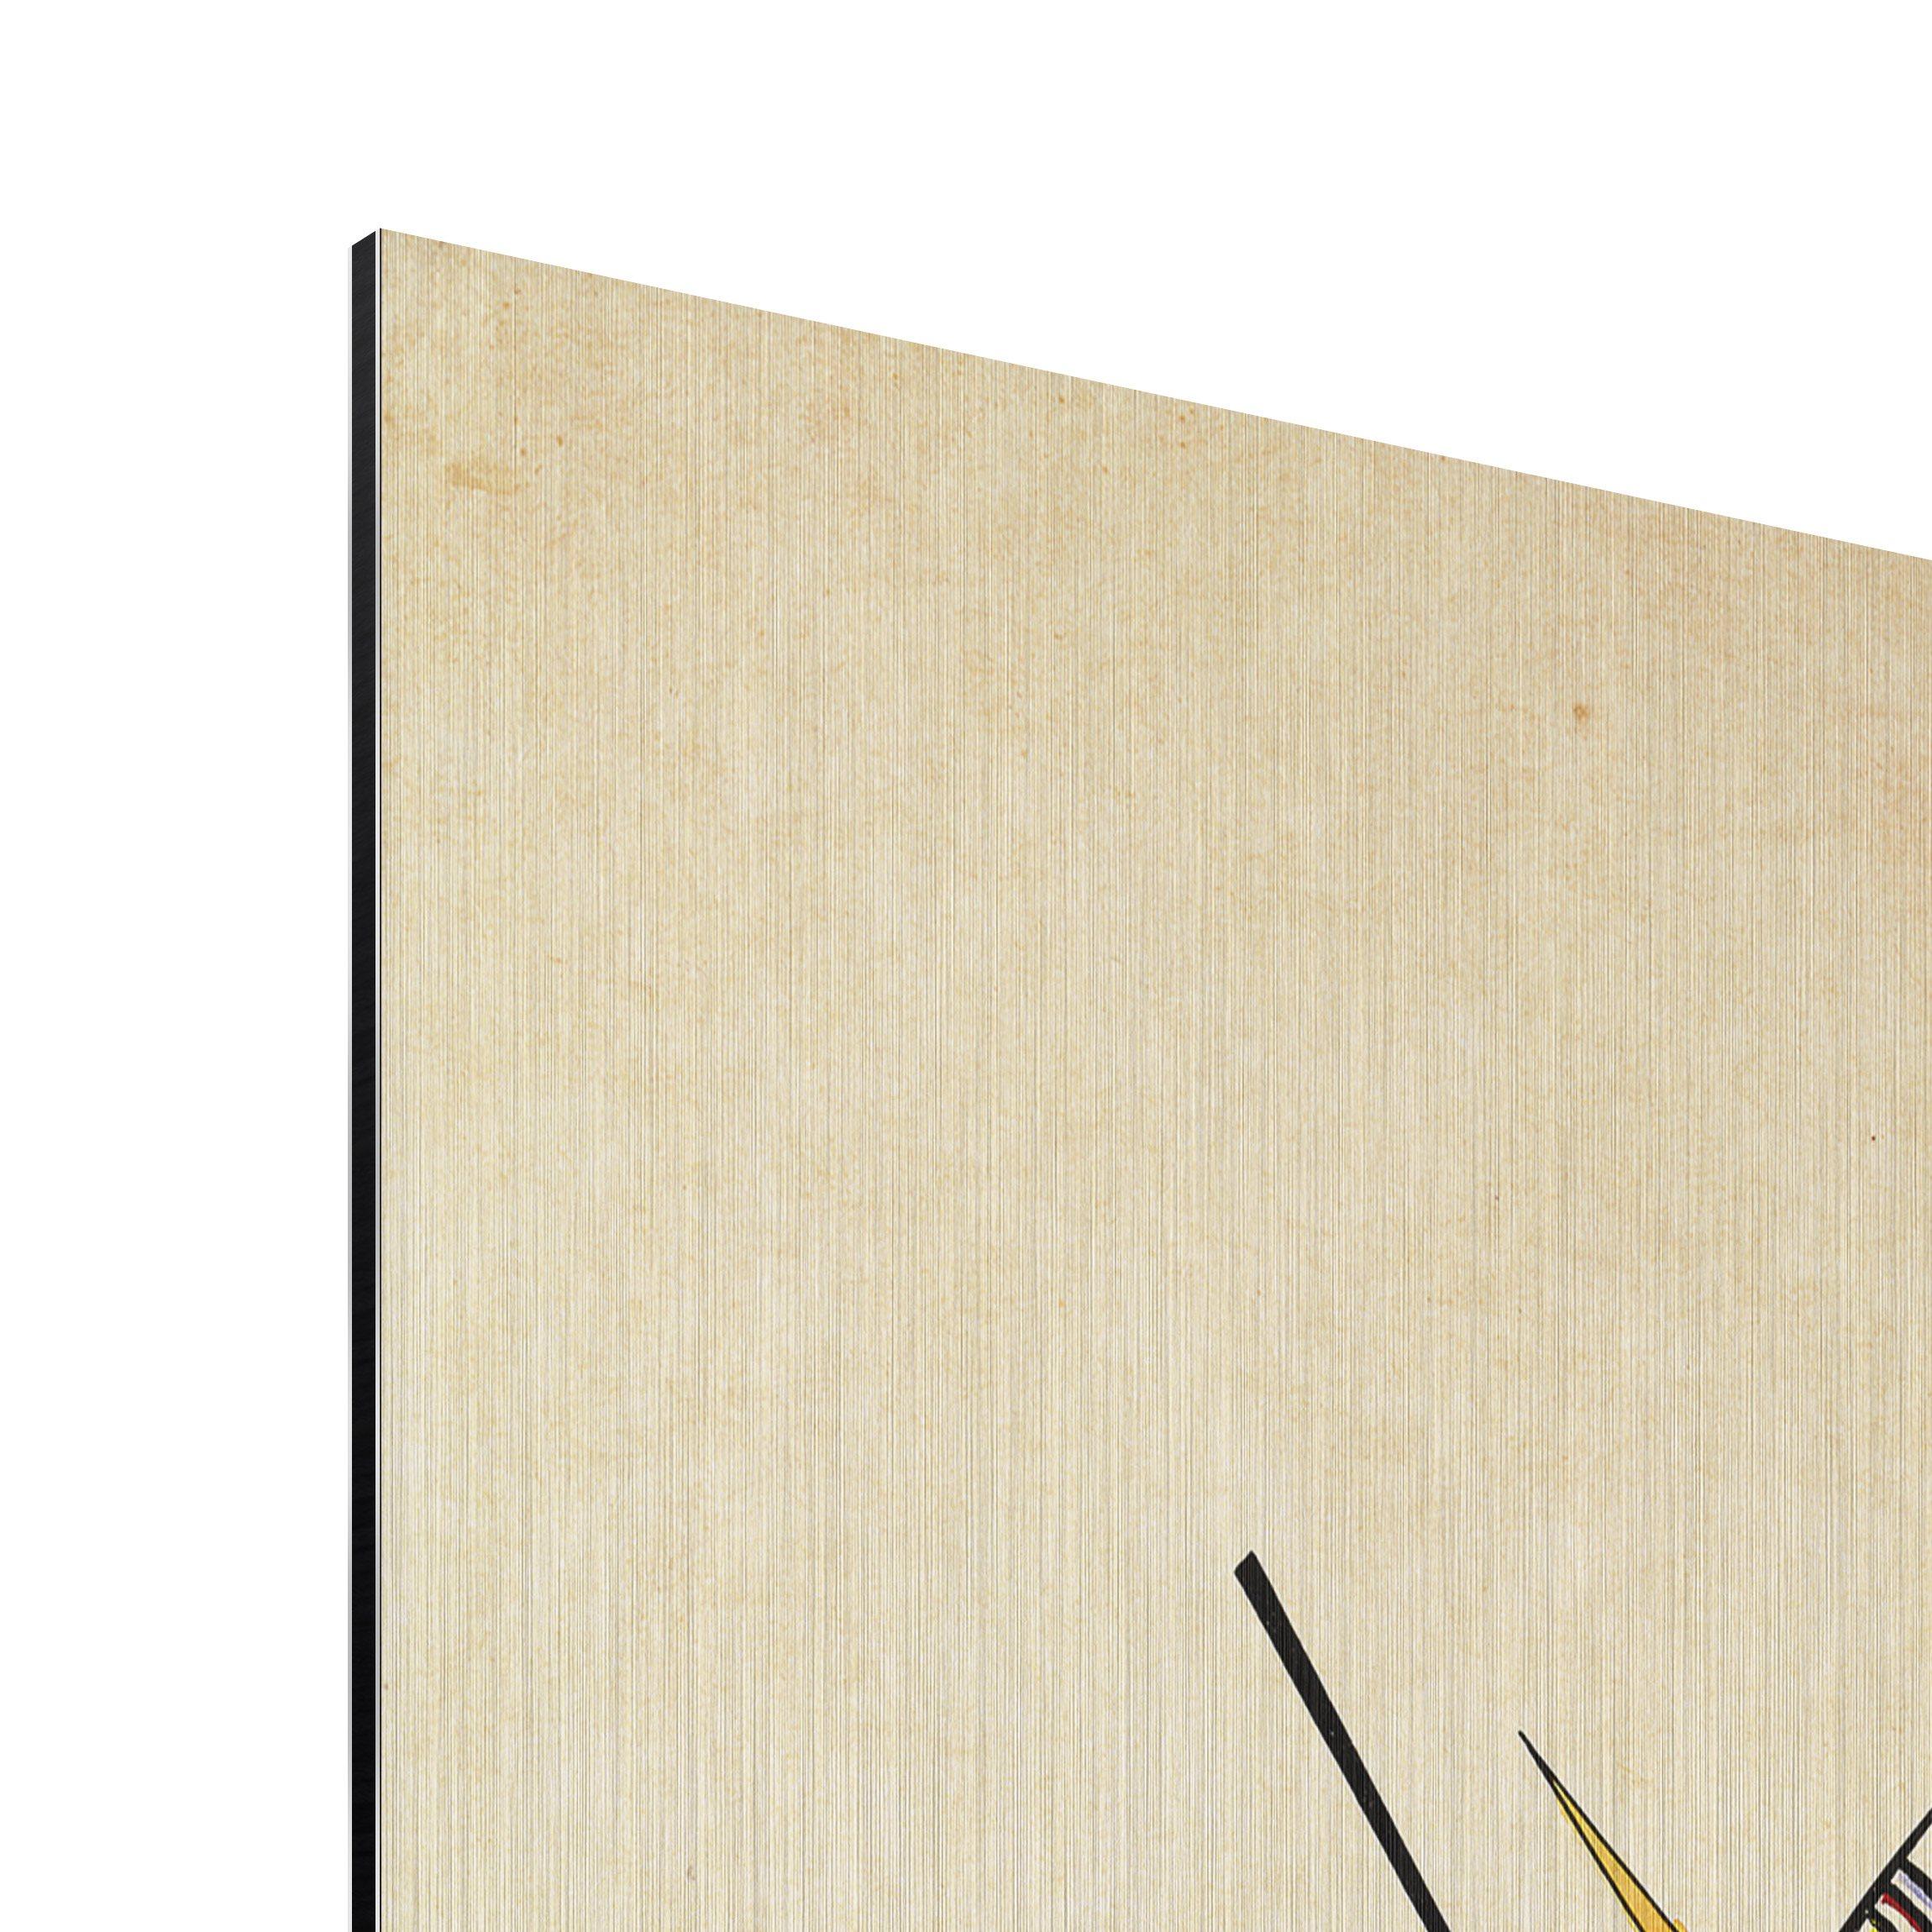 alu dibond geb rstet kunstdruck wassily kandinsky jahresgabe f r die kandinsky gesellschaft. Black Bedroom Furniture Sets. Home Design Ideas